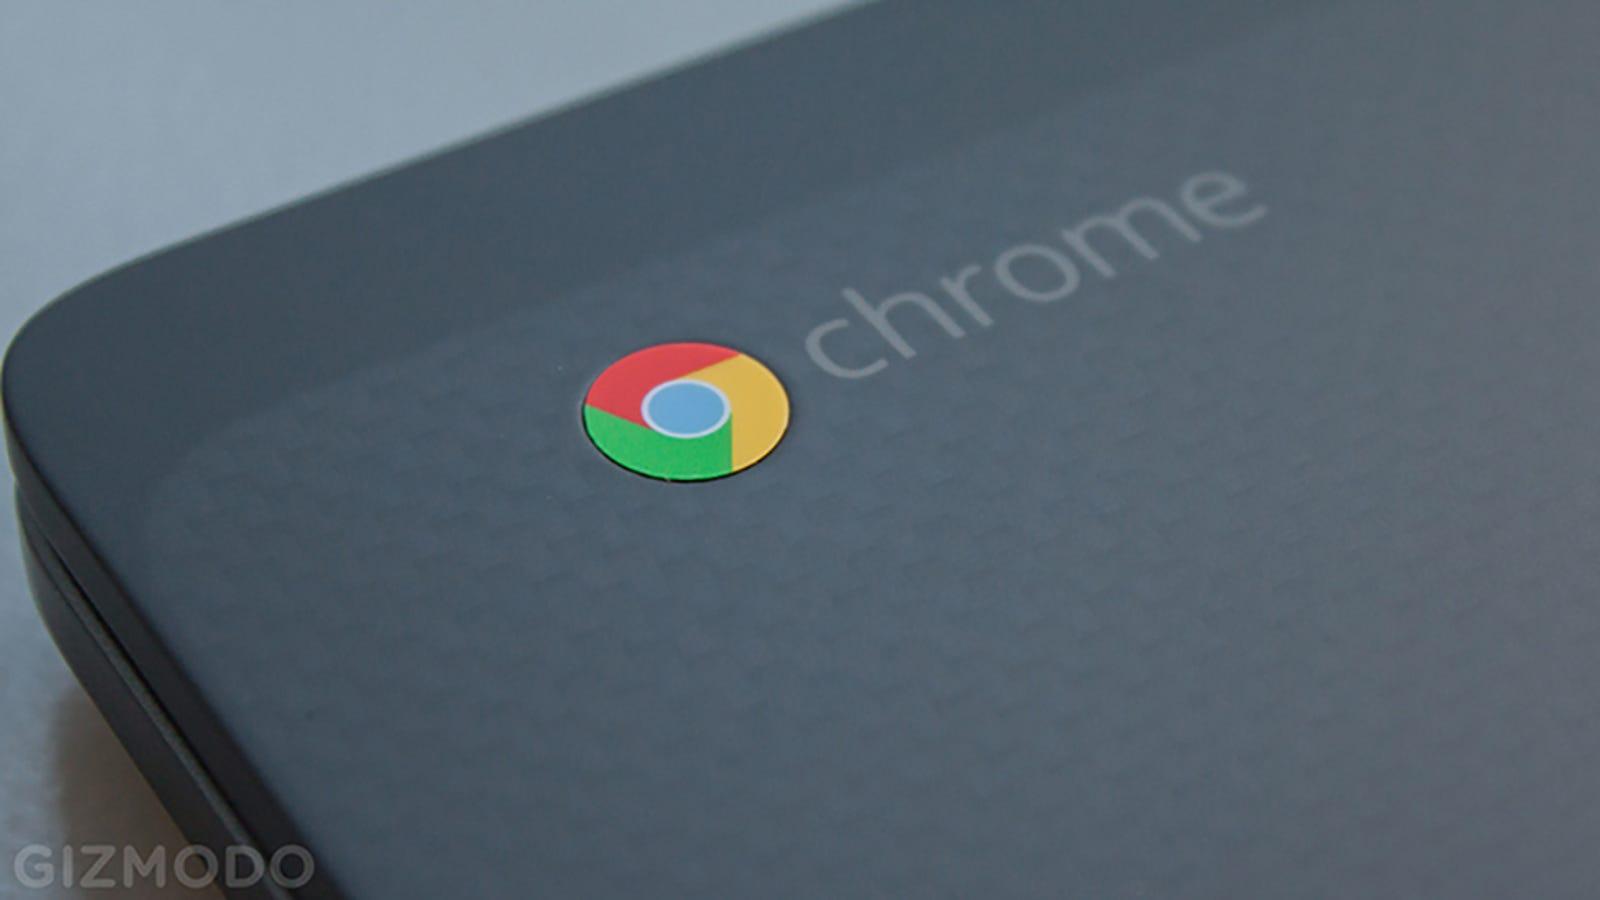 7 Tasks Chromebooks Still Can't Do As Well As Macs or PCs